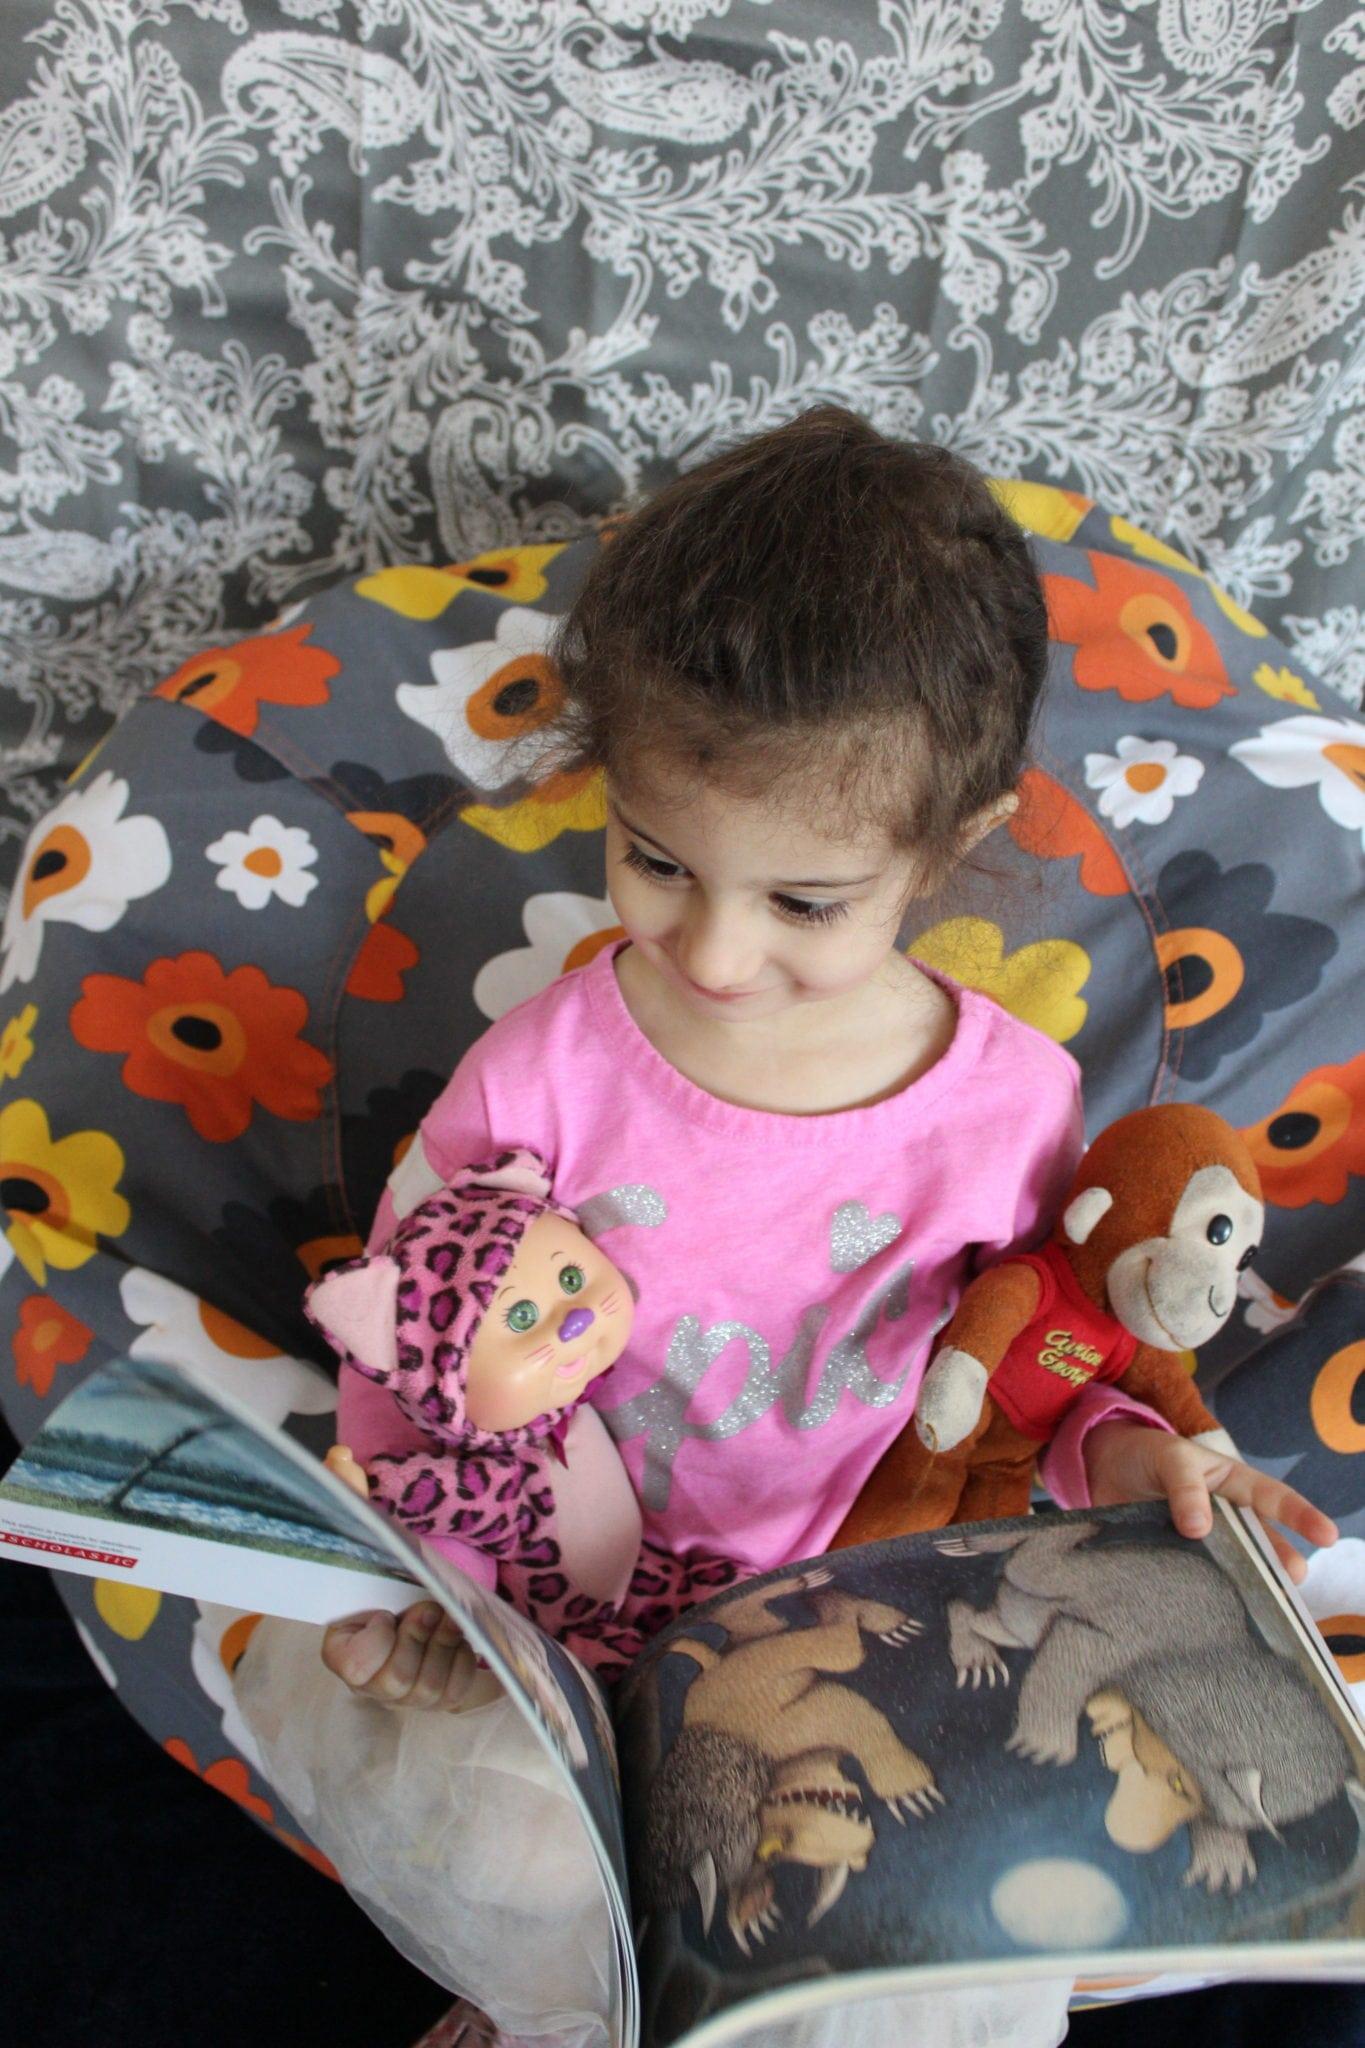 brown hair toddler reading book stuffed animals